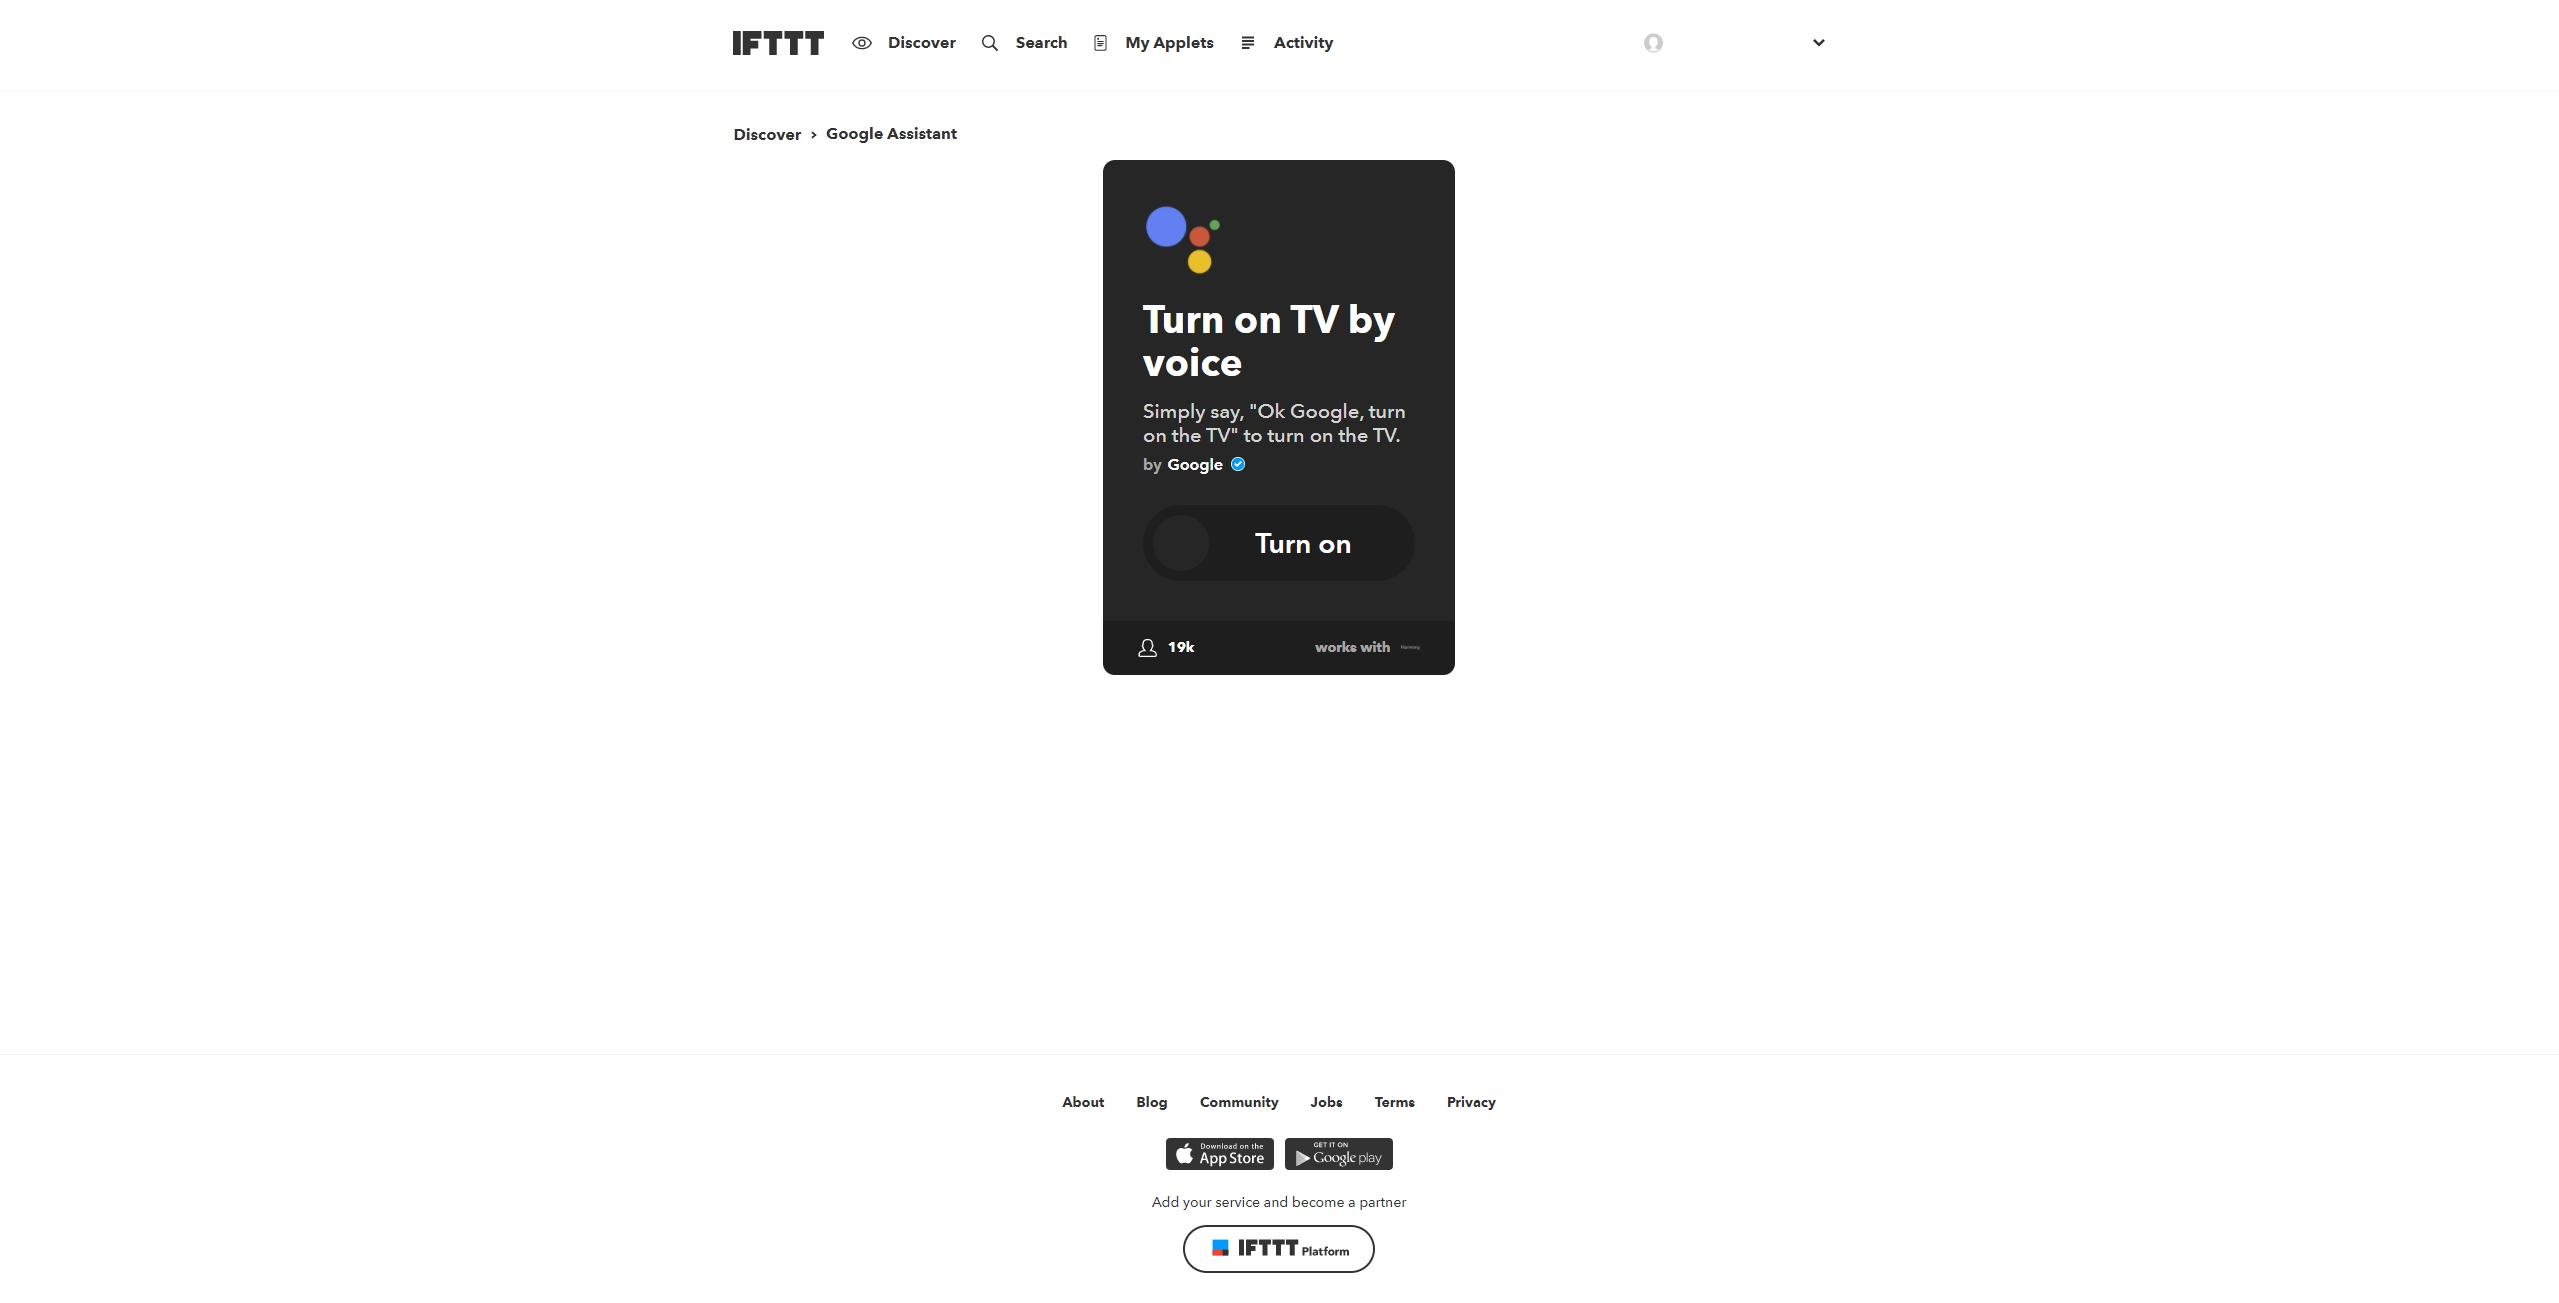 IFTTT-Google-Harmony-Applet-1